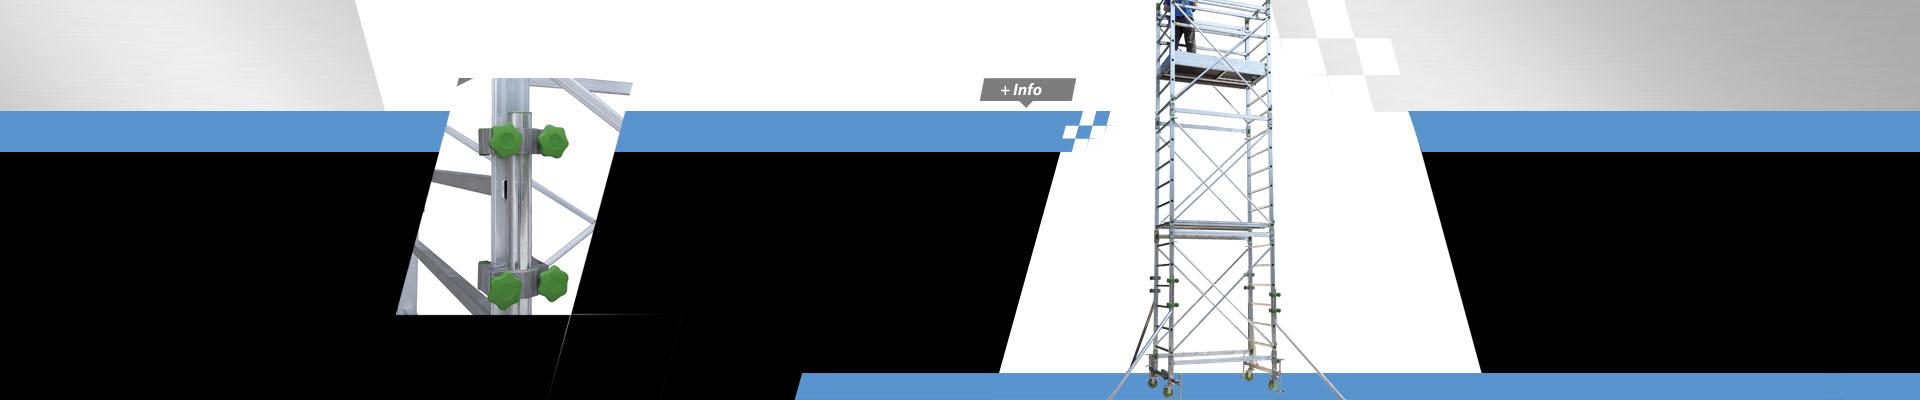 BANNER3-escaleras-andamios1